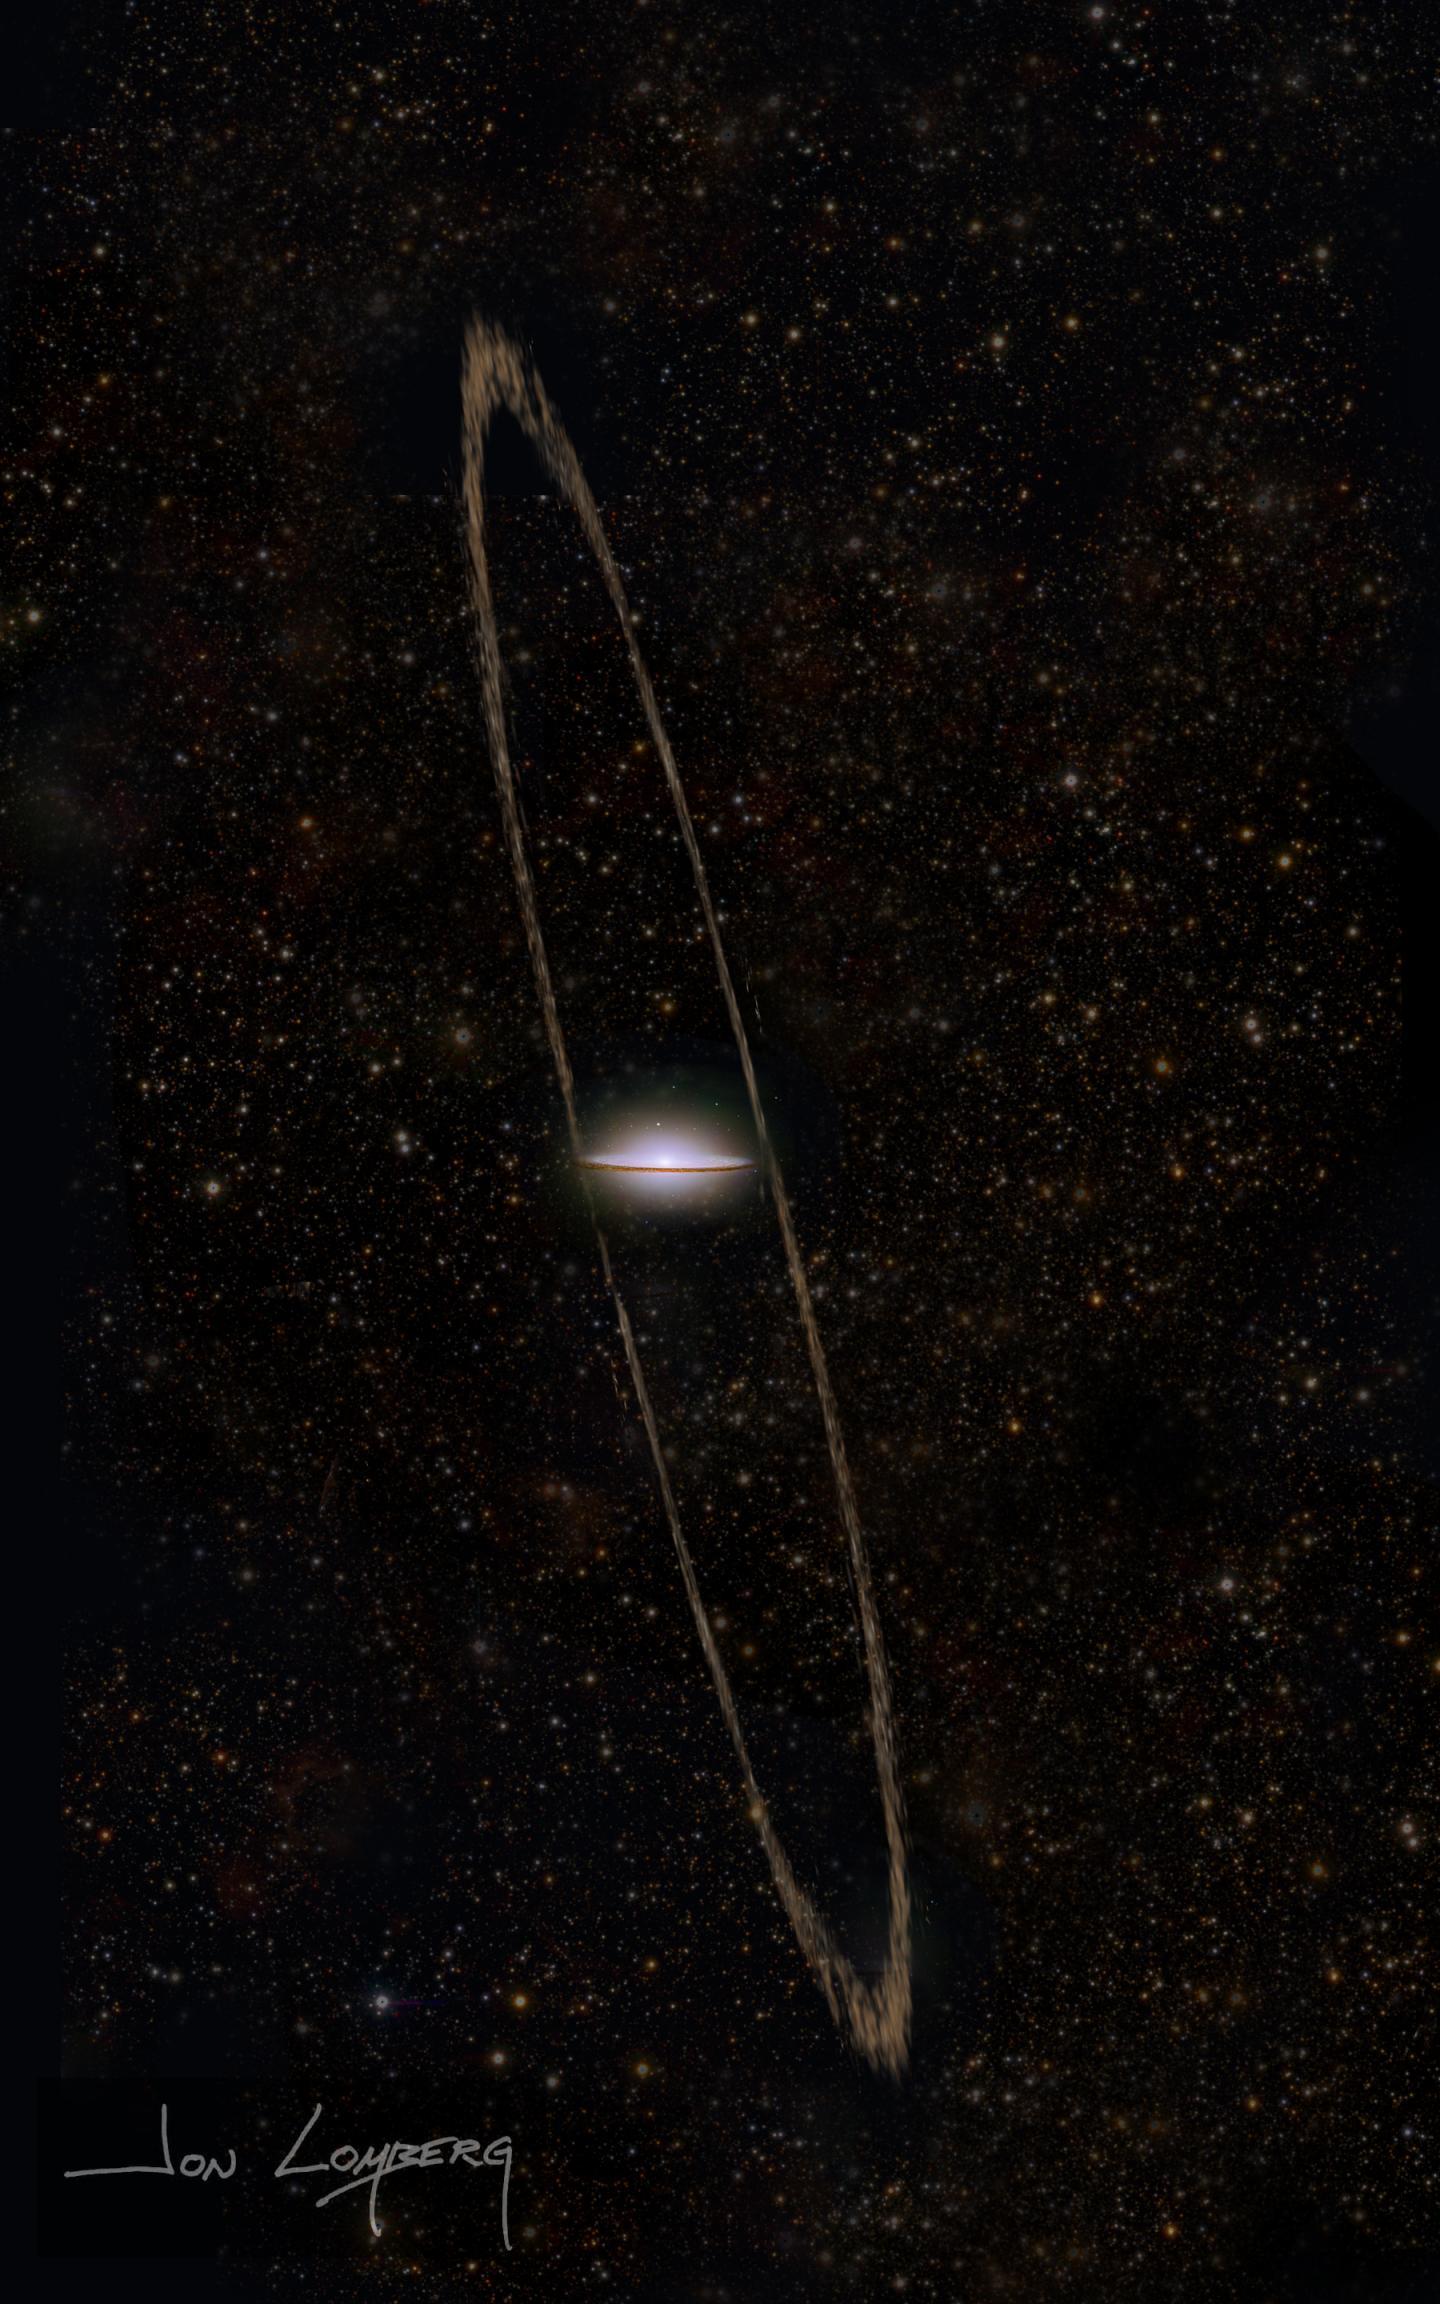 Artist's conception of the tidal stream of the Sombrero galaxy (M104)